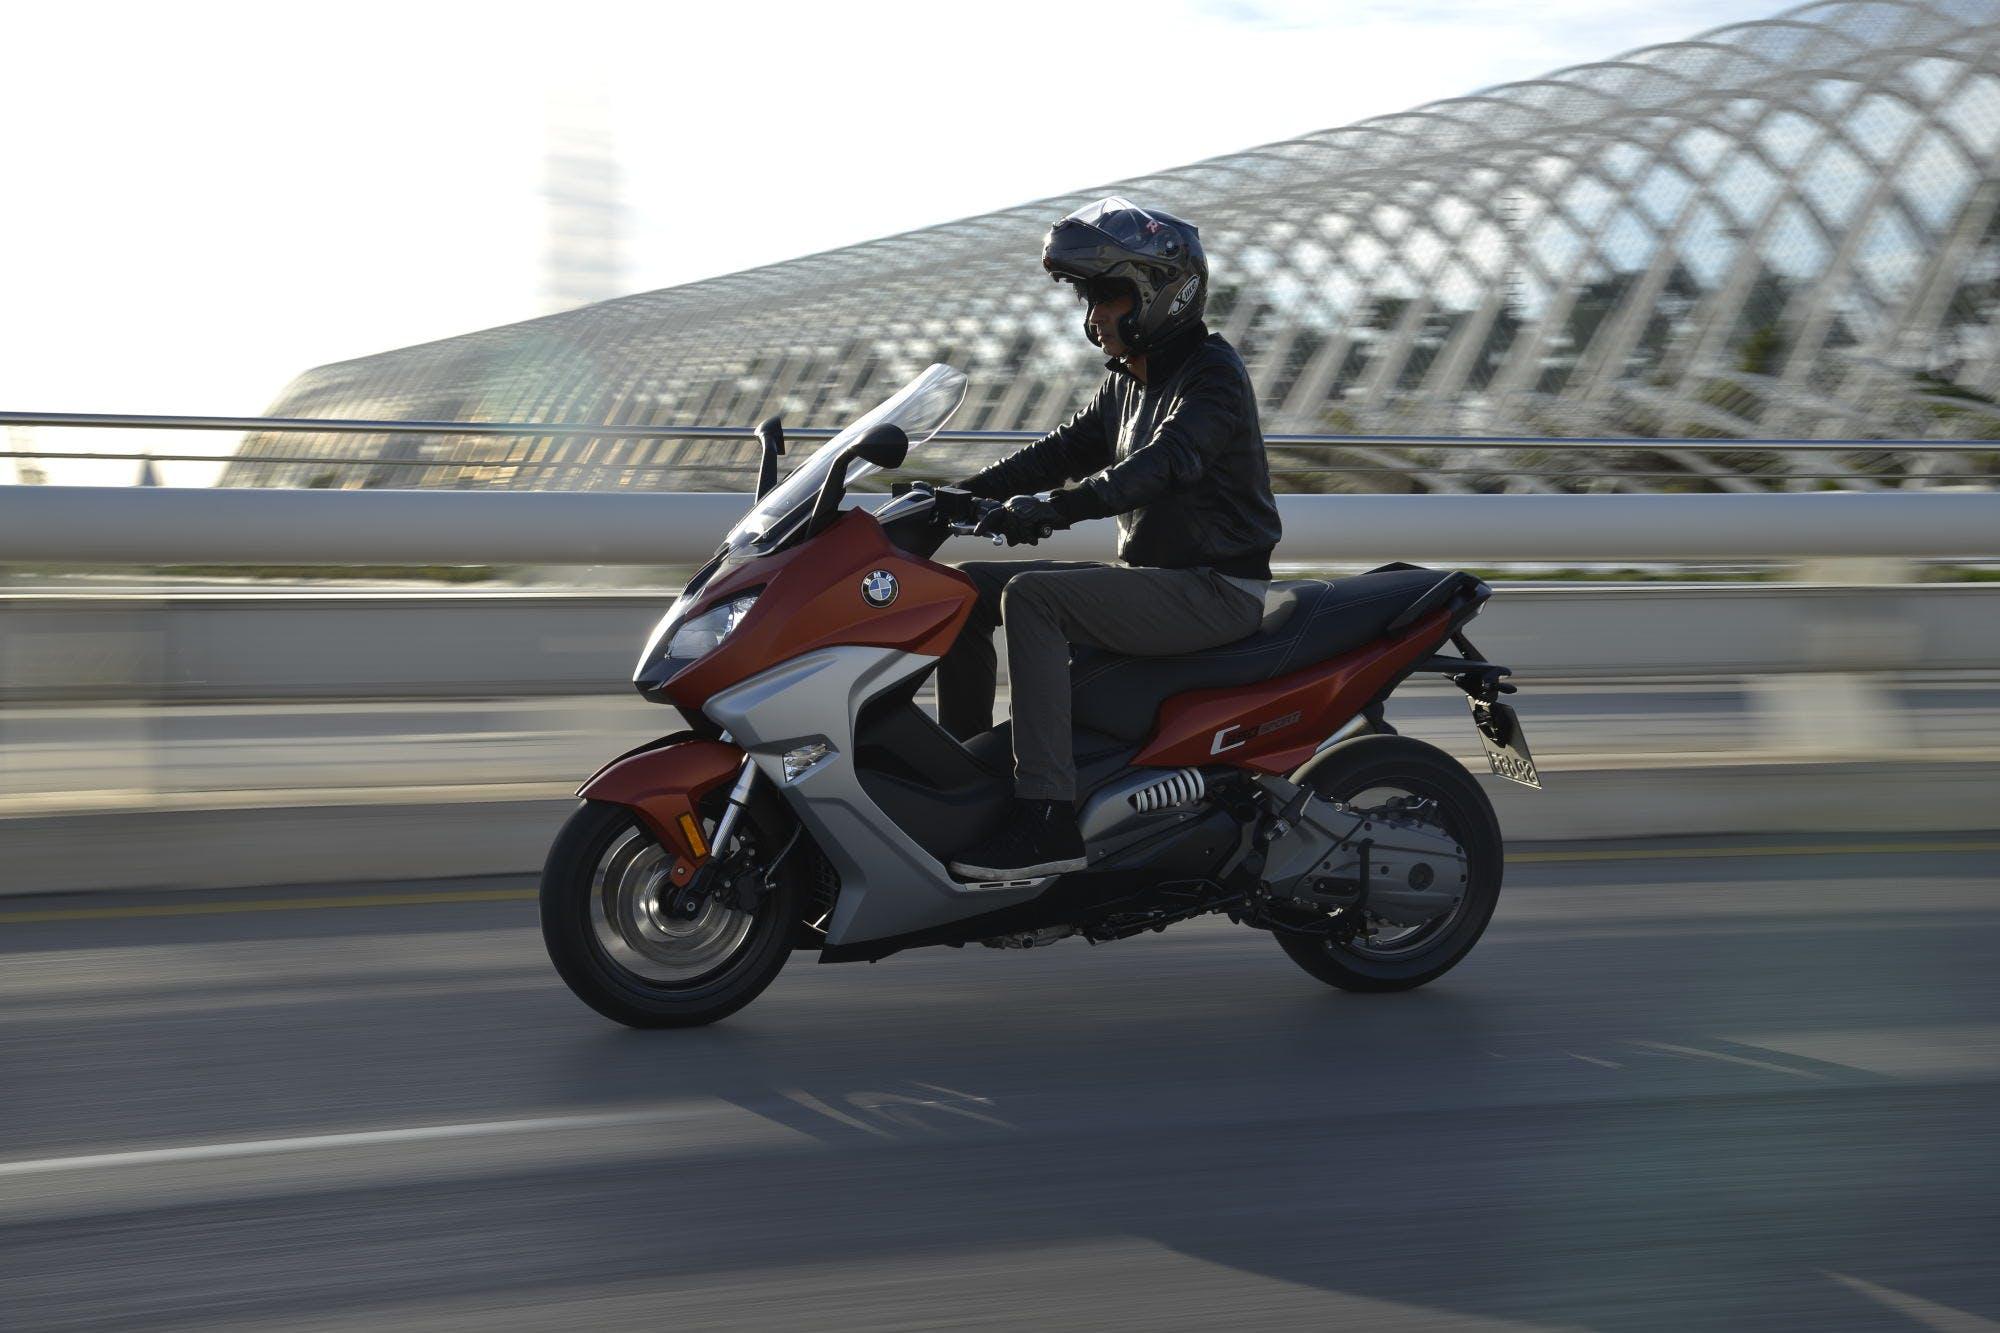 BMW C650 Sport migliori maxi scooter